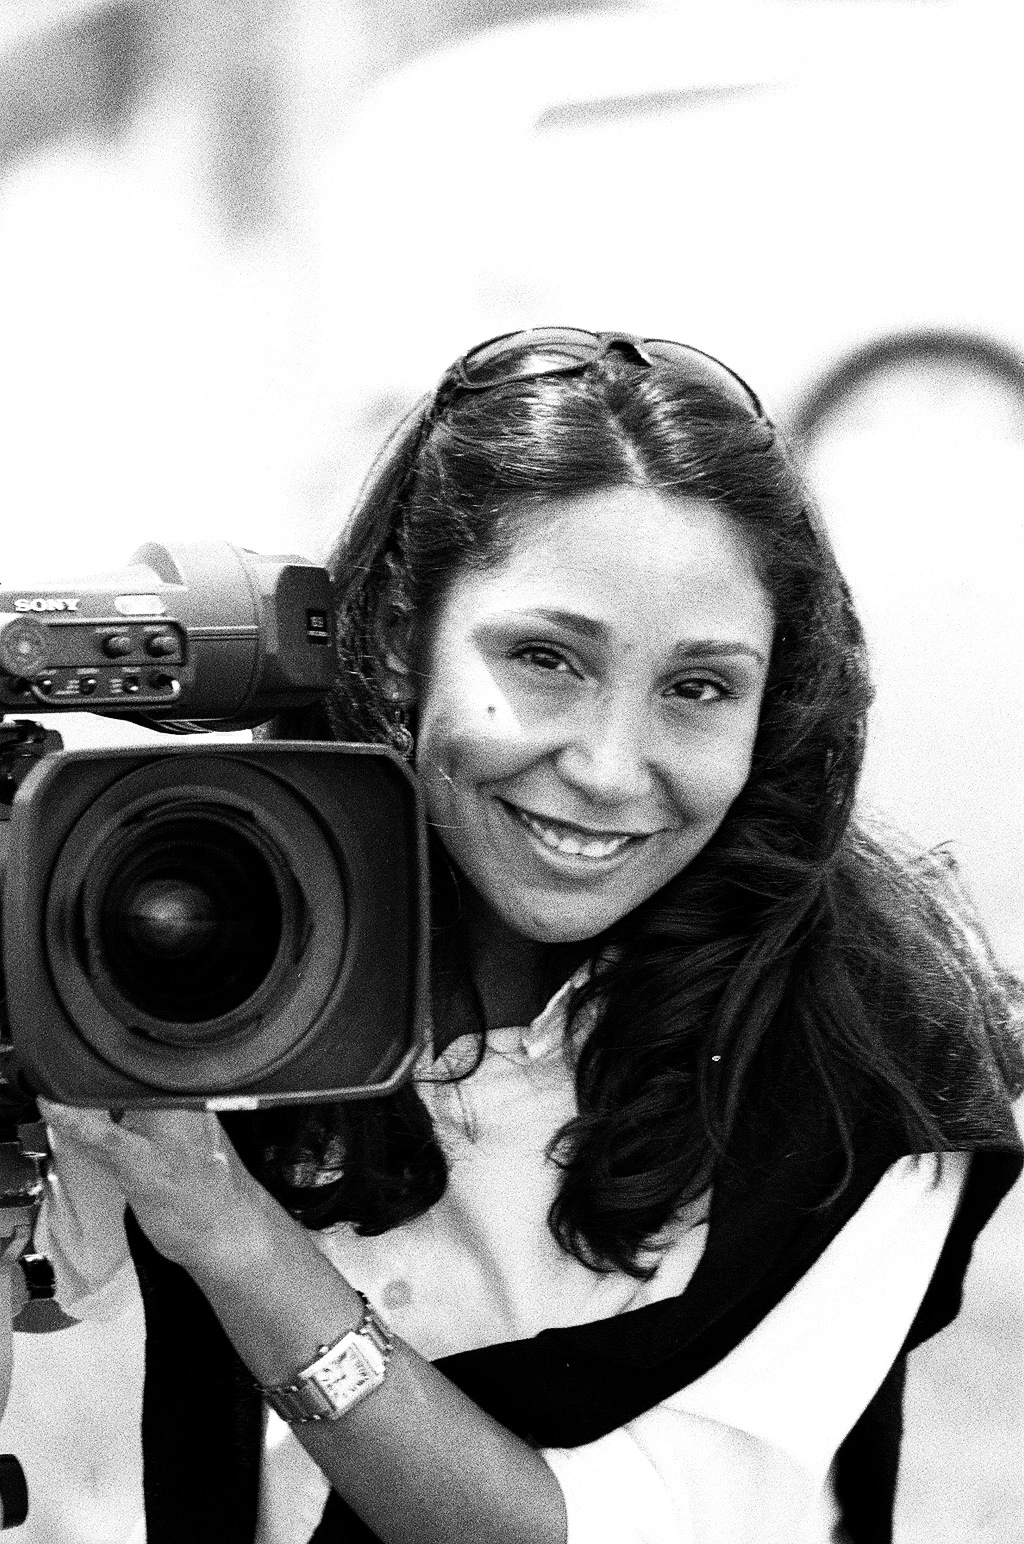 Haifaa Al-Mansour, the director